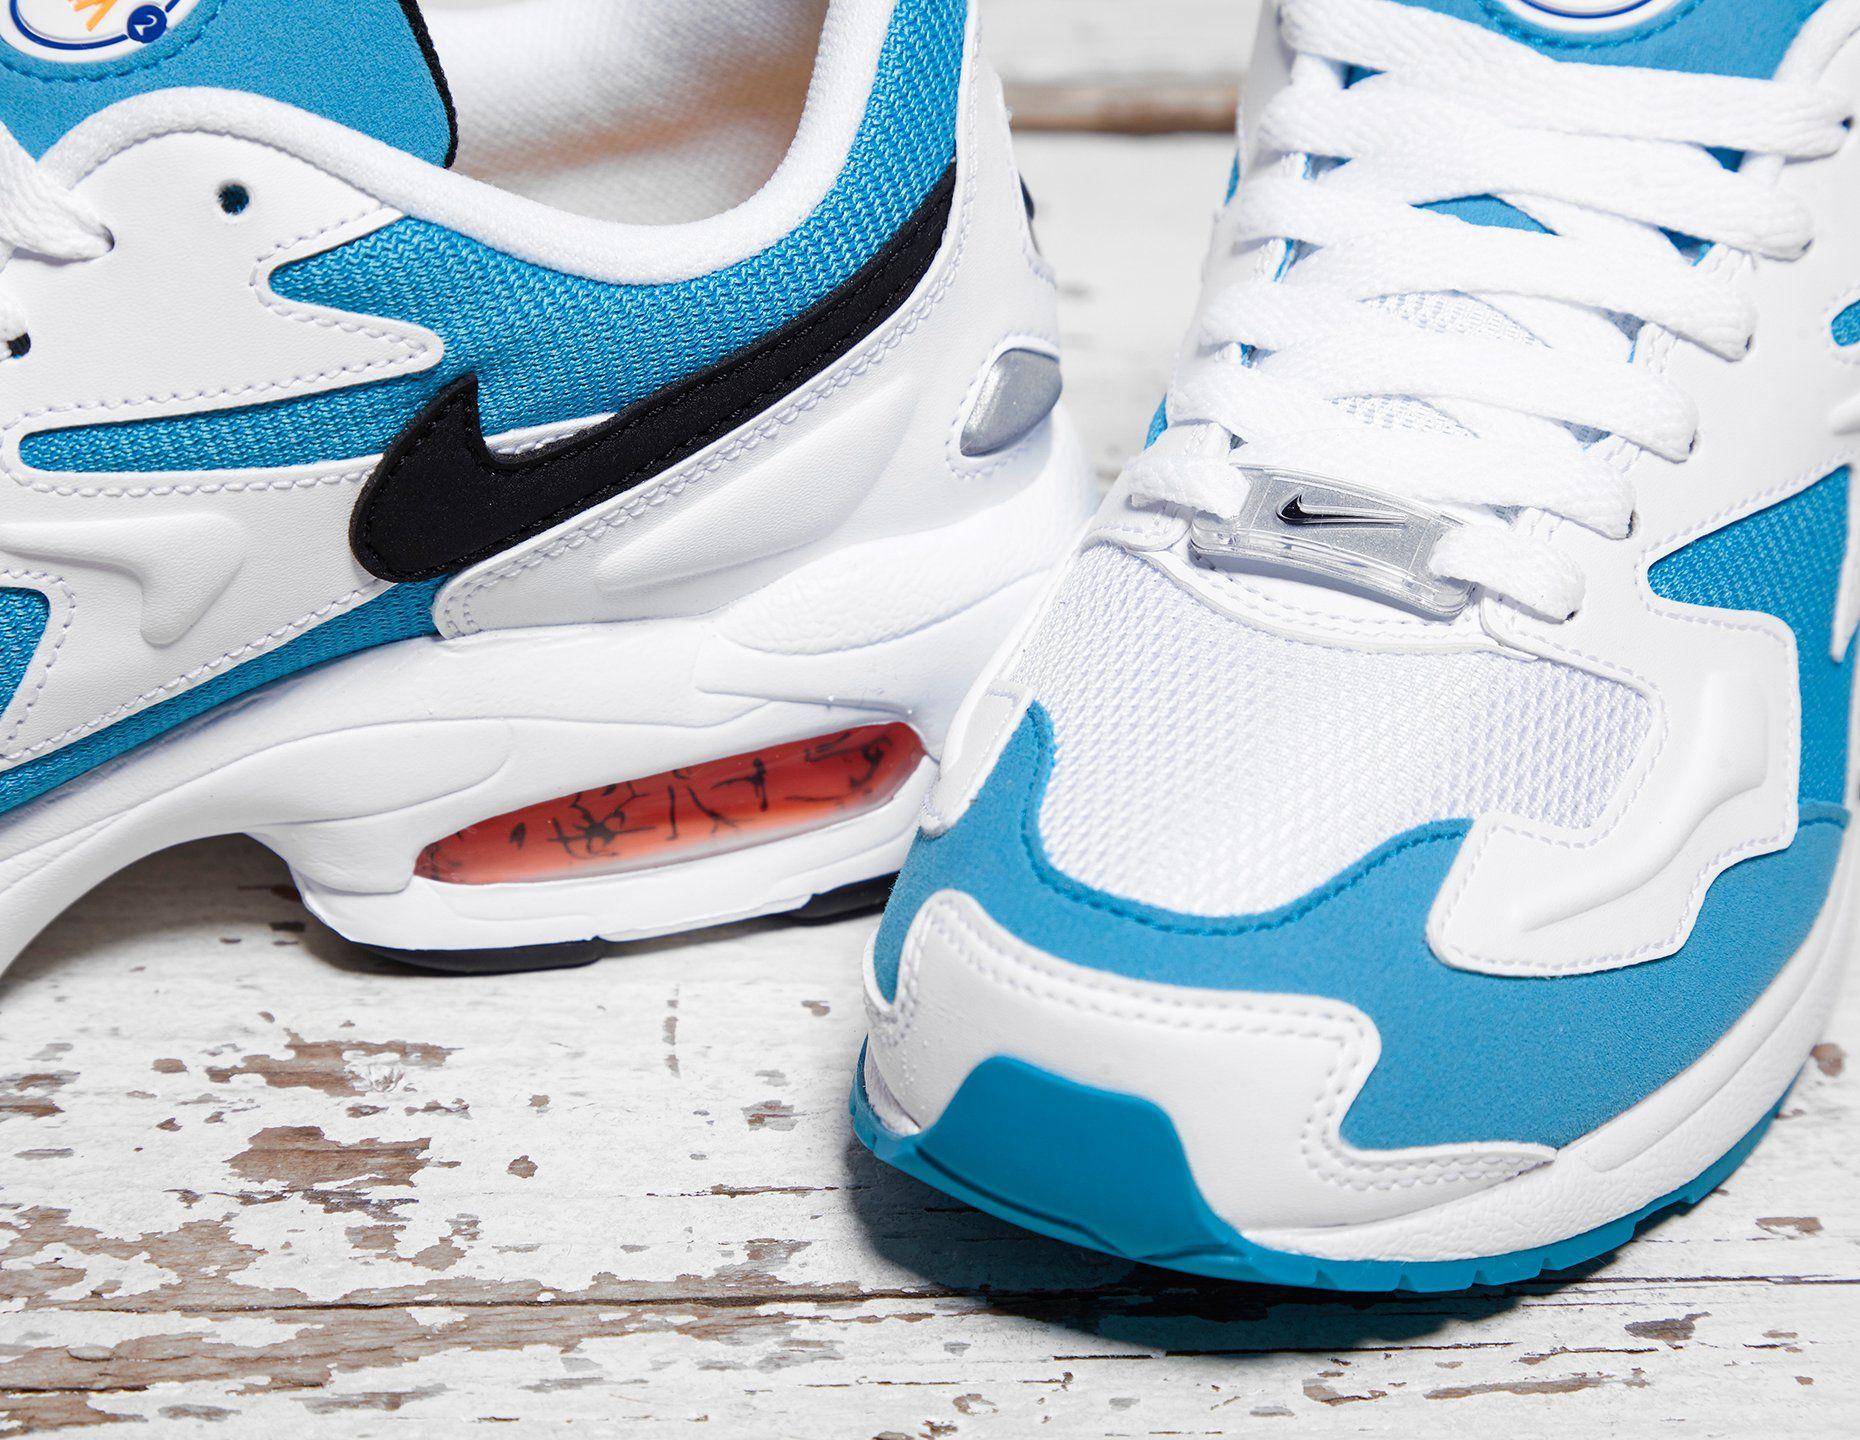 Nike Air Max2 Light Women's